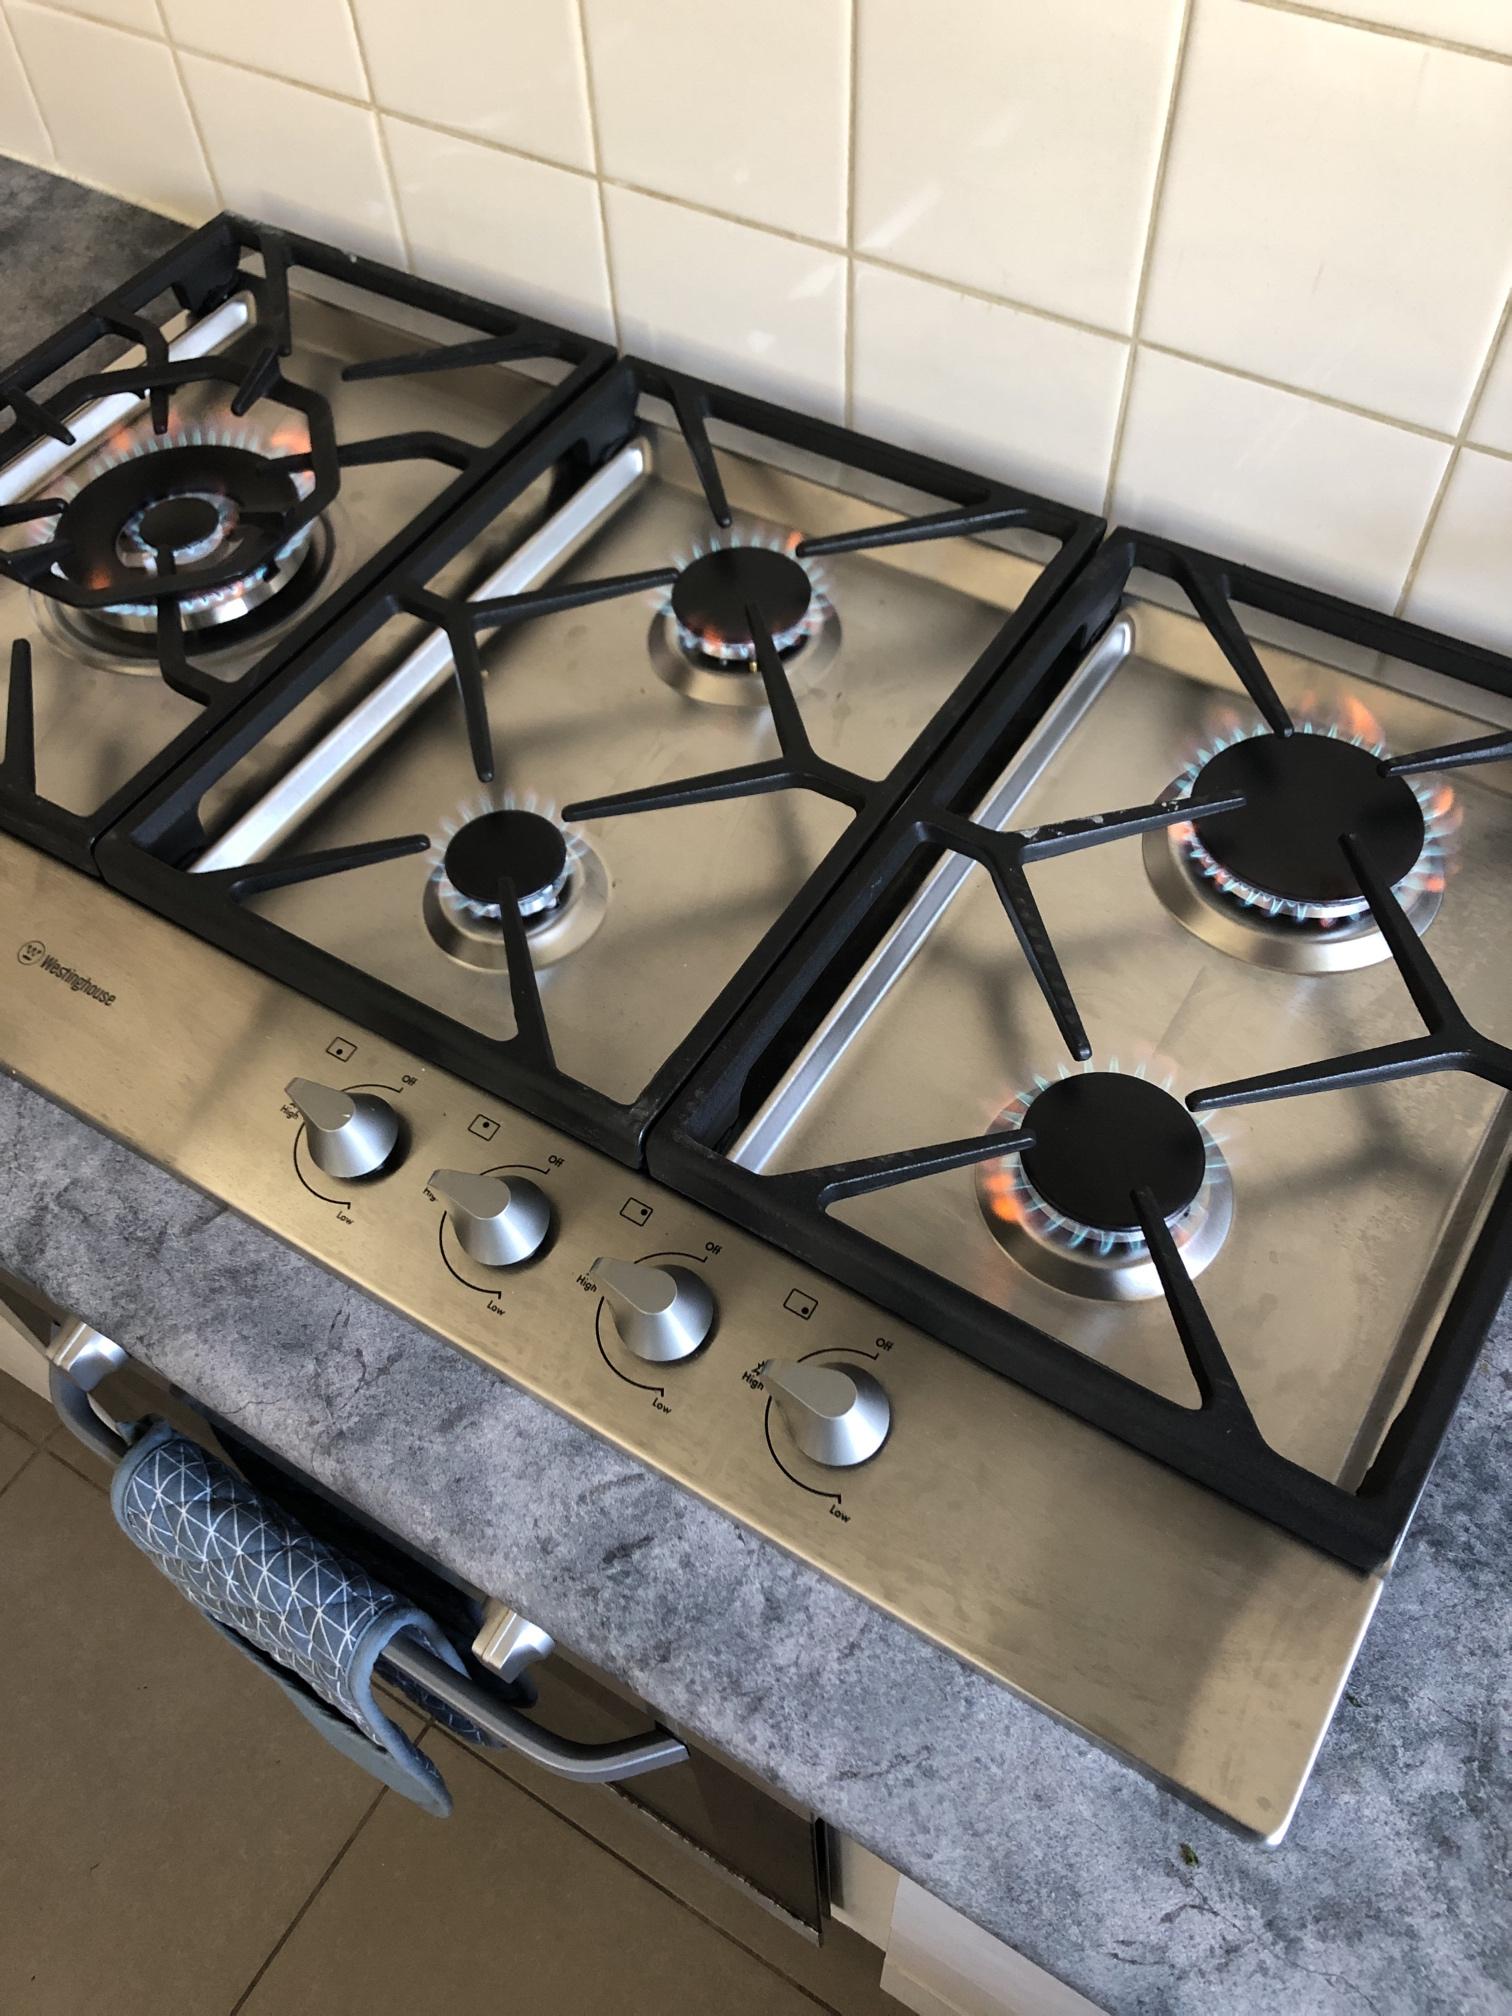 gas-appliance-installation-adelaide-darw